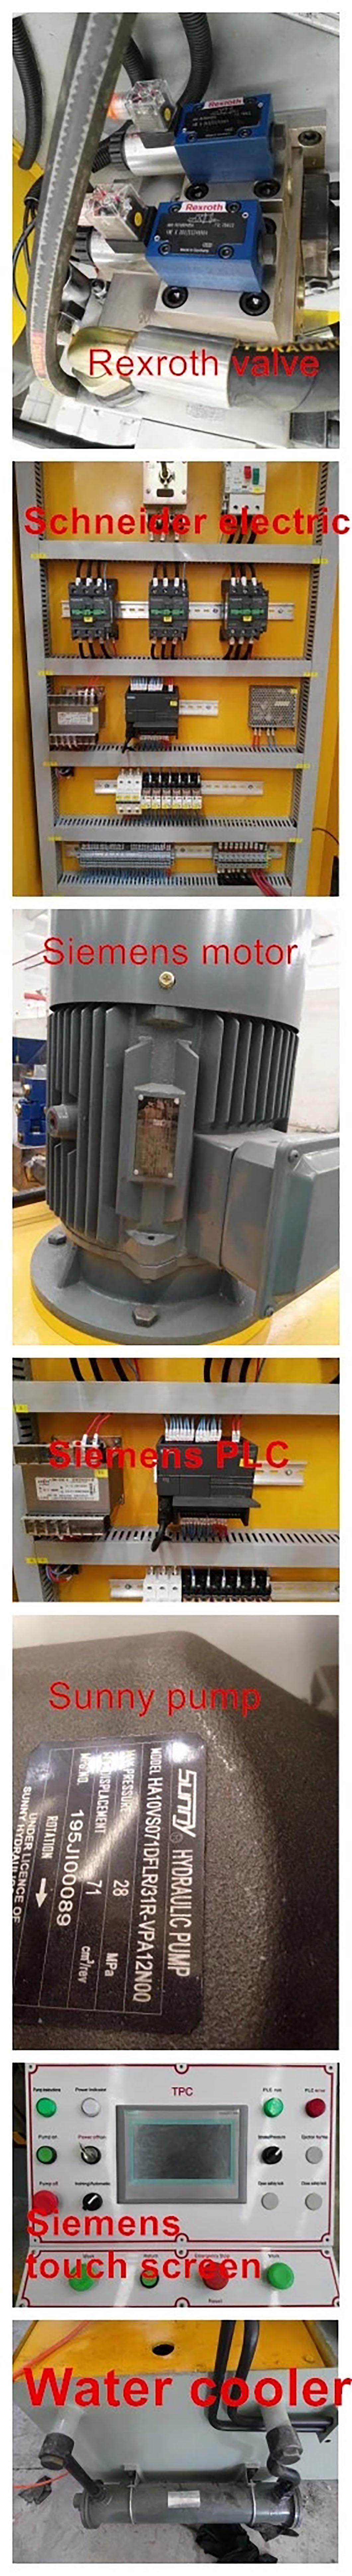 hydraulic_press_components